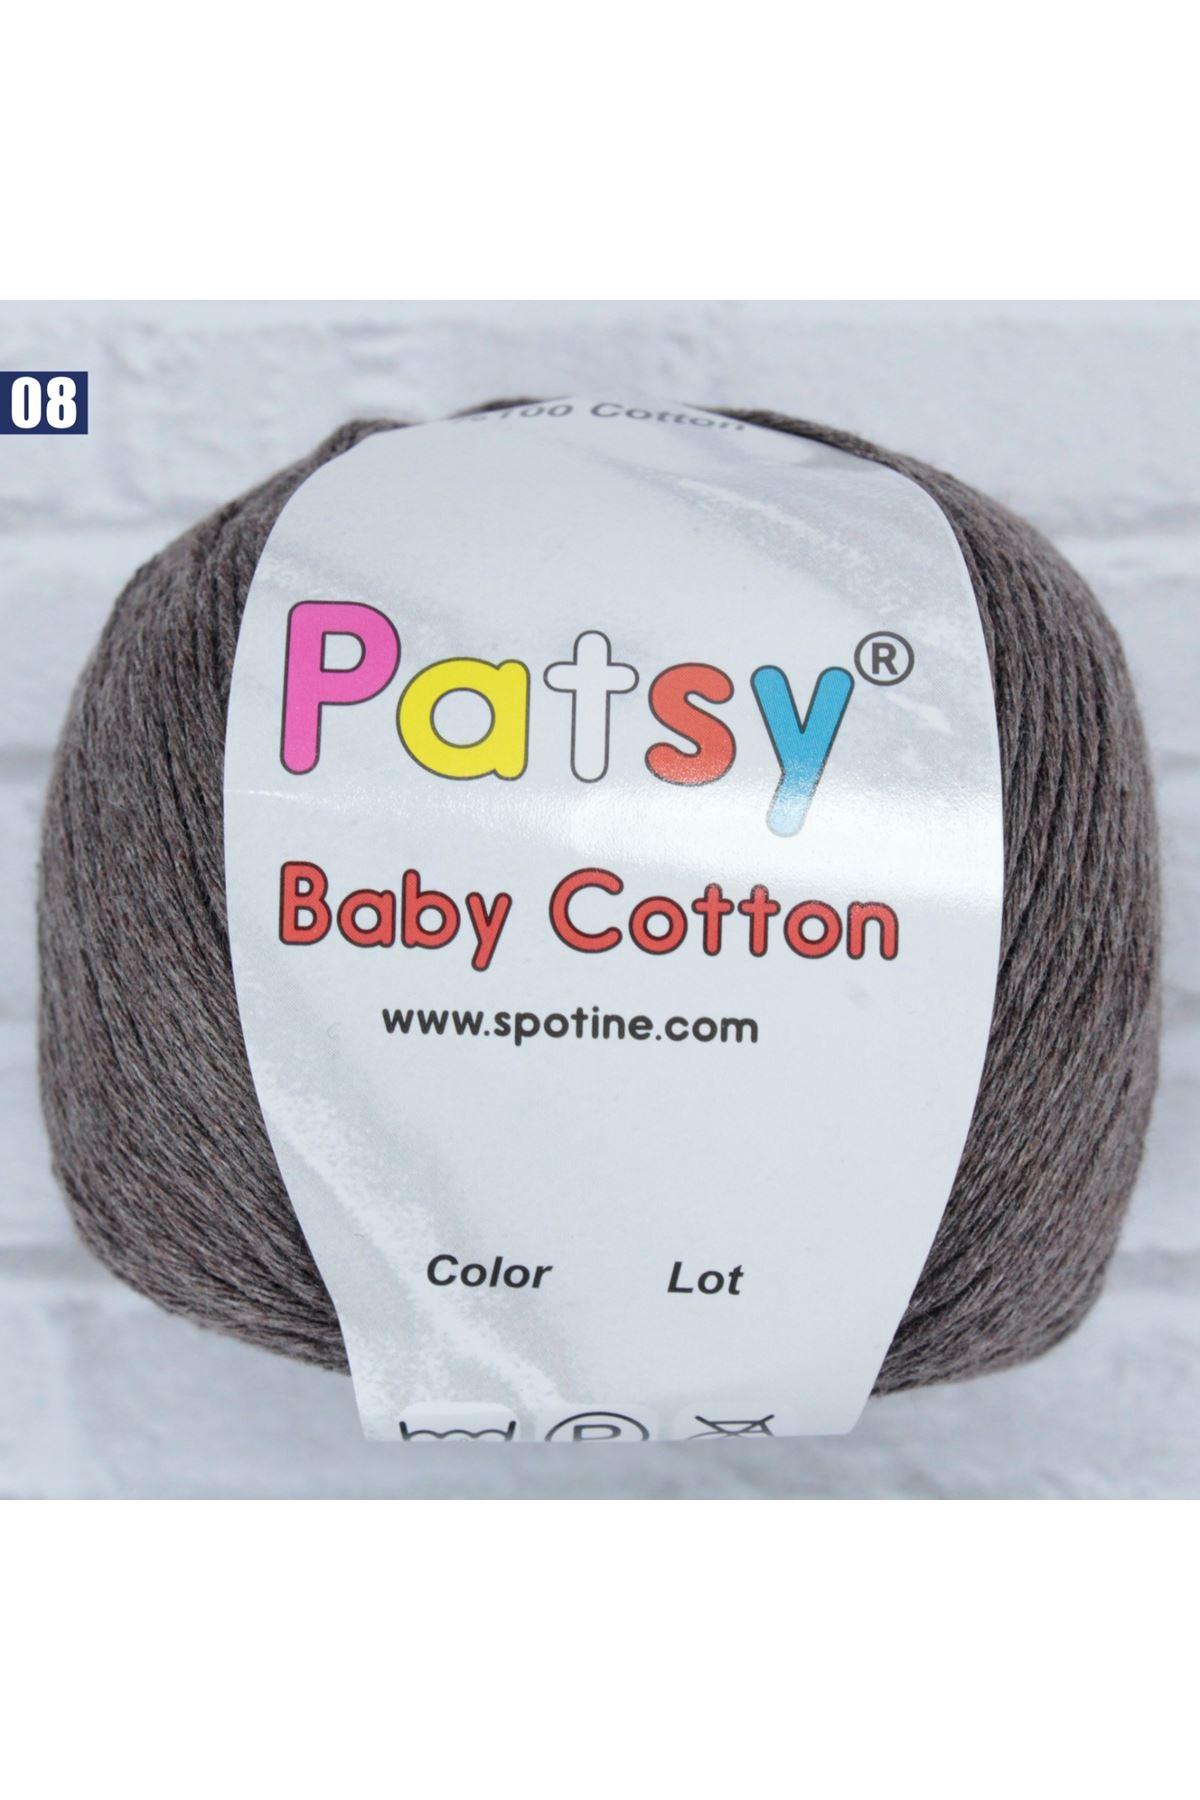 Patsy Baby Cotton 08